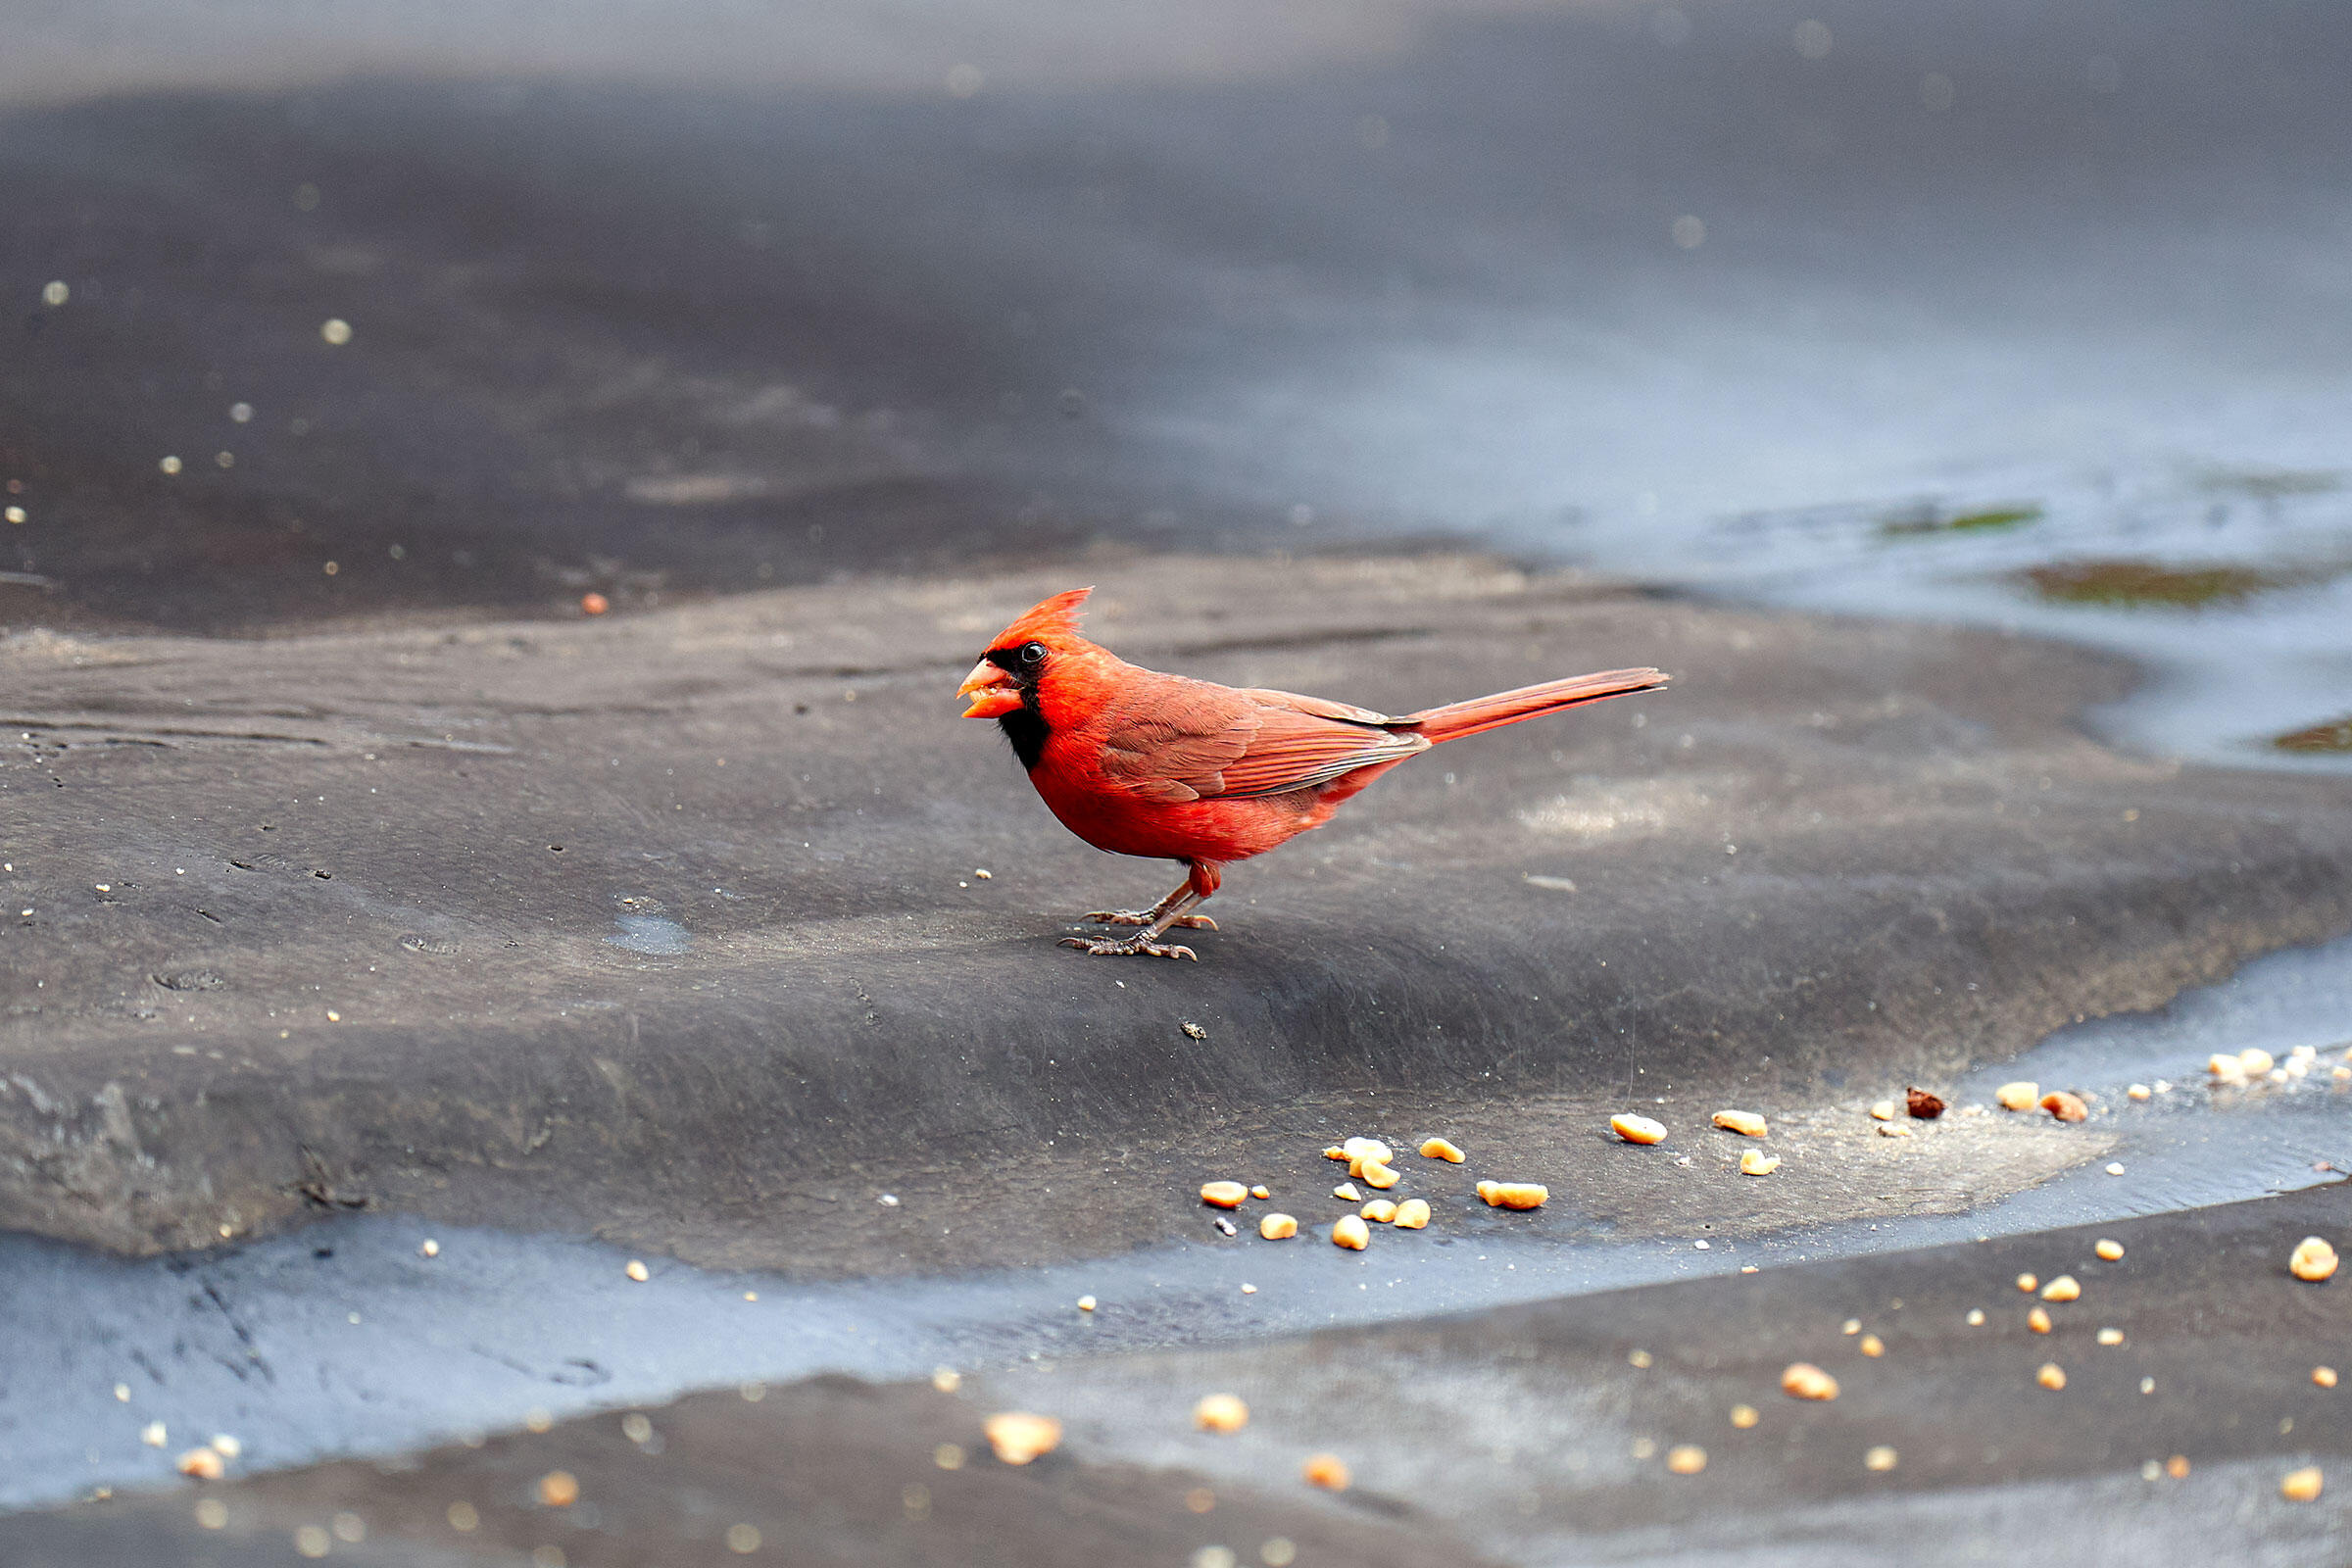 Northern Cardinal. Amelia Grande, West New York, NJ